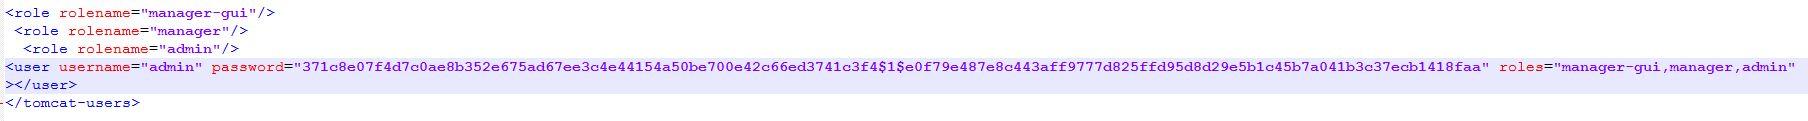 tomcat users xml file